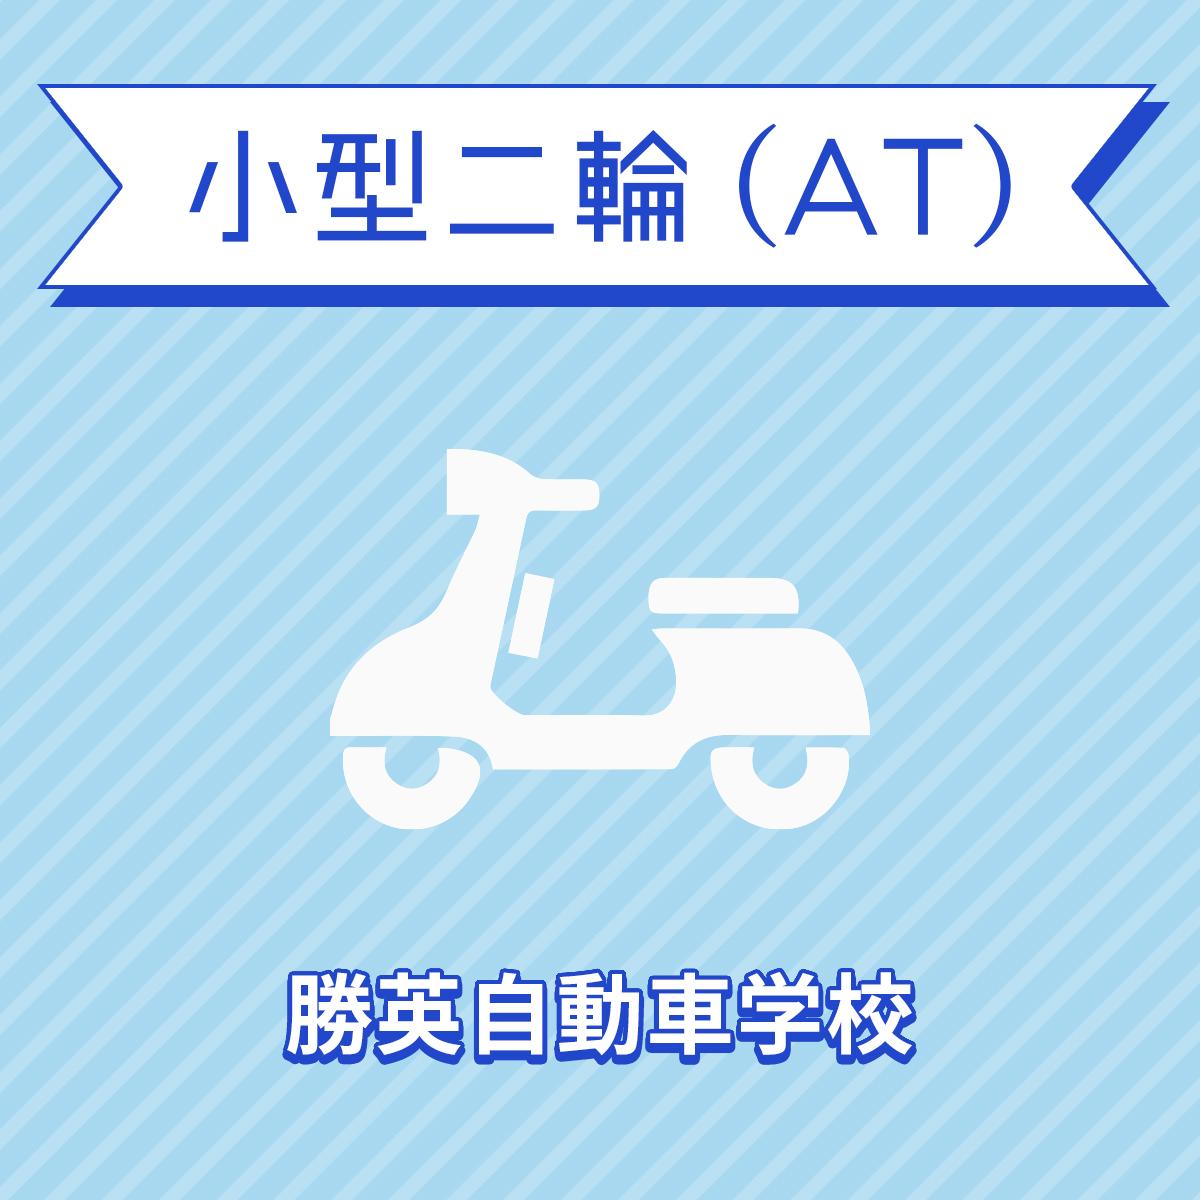 【岡山県勝田郡】小型二輪ATコース(一般料金)<免許なし/原付免許所持対象>